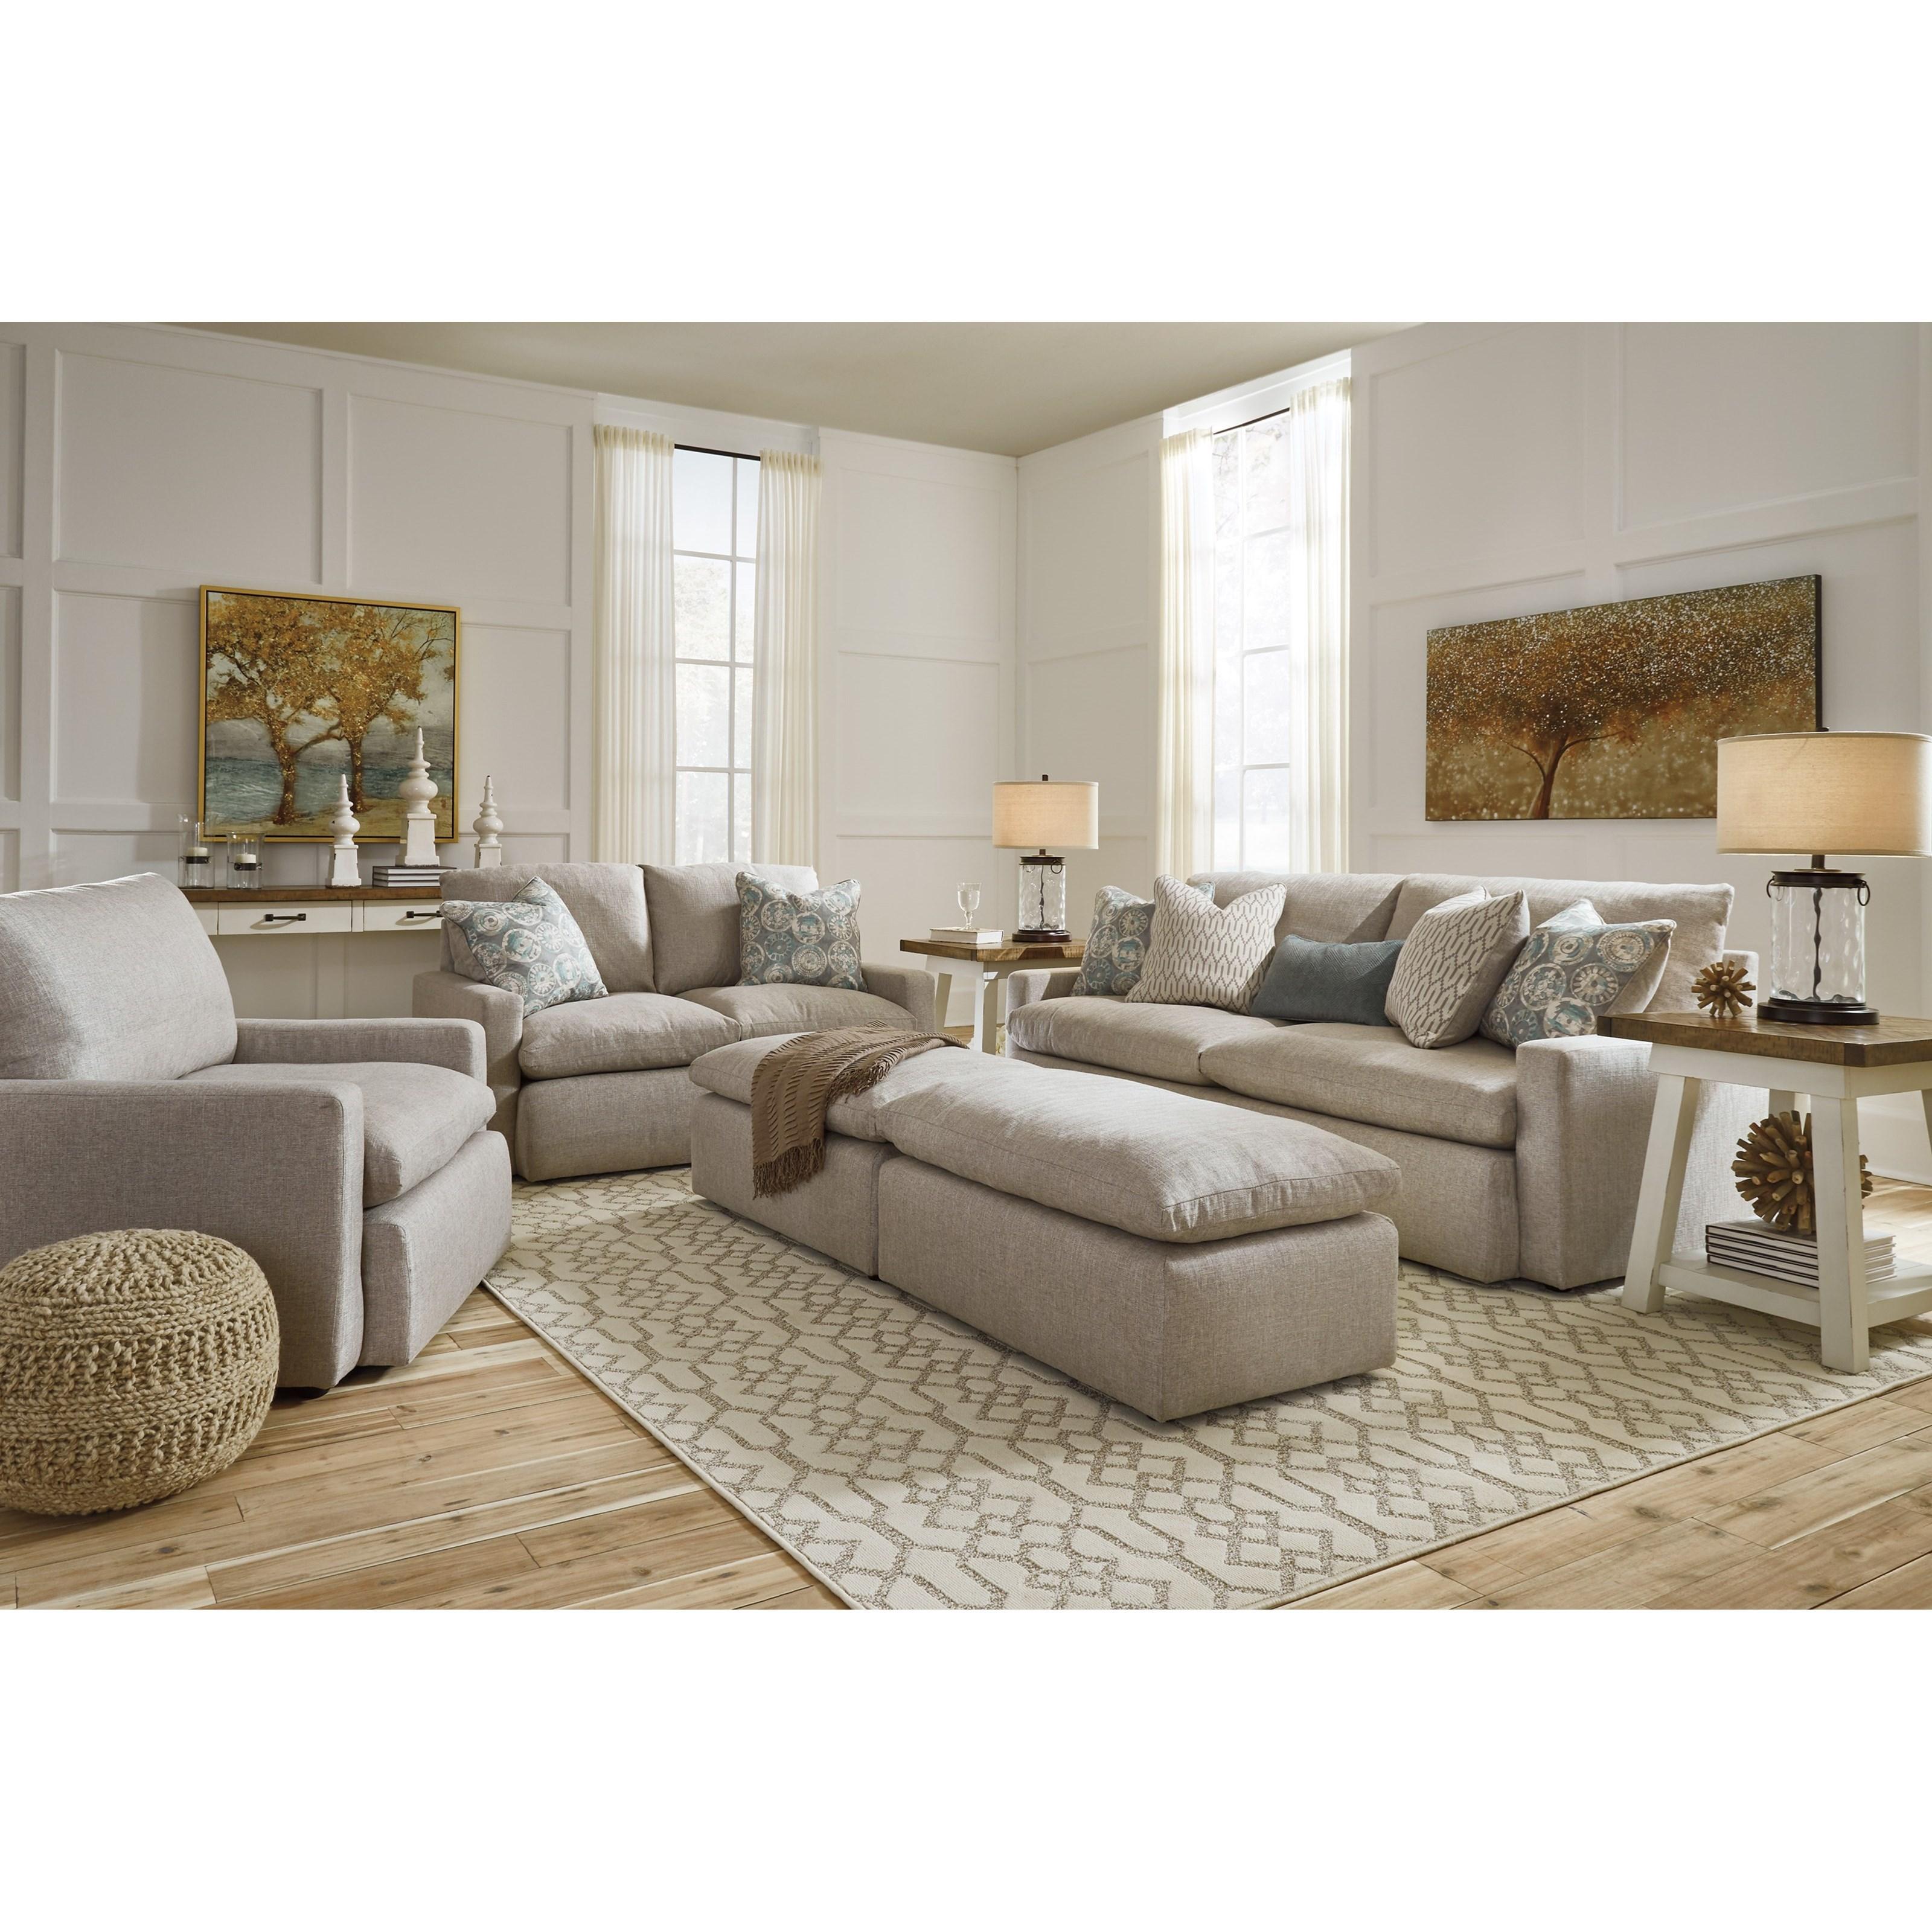 Benchcraft Melilla Stationary Living Room Group Value